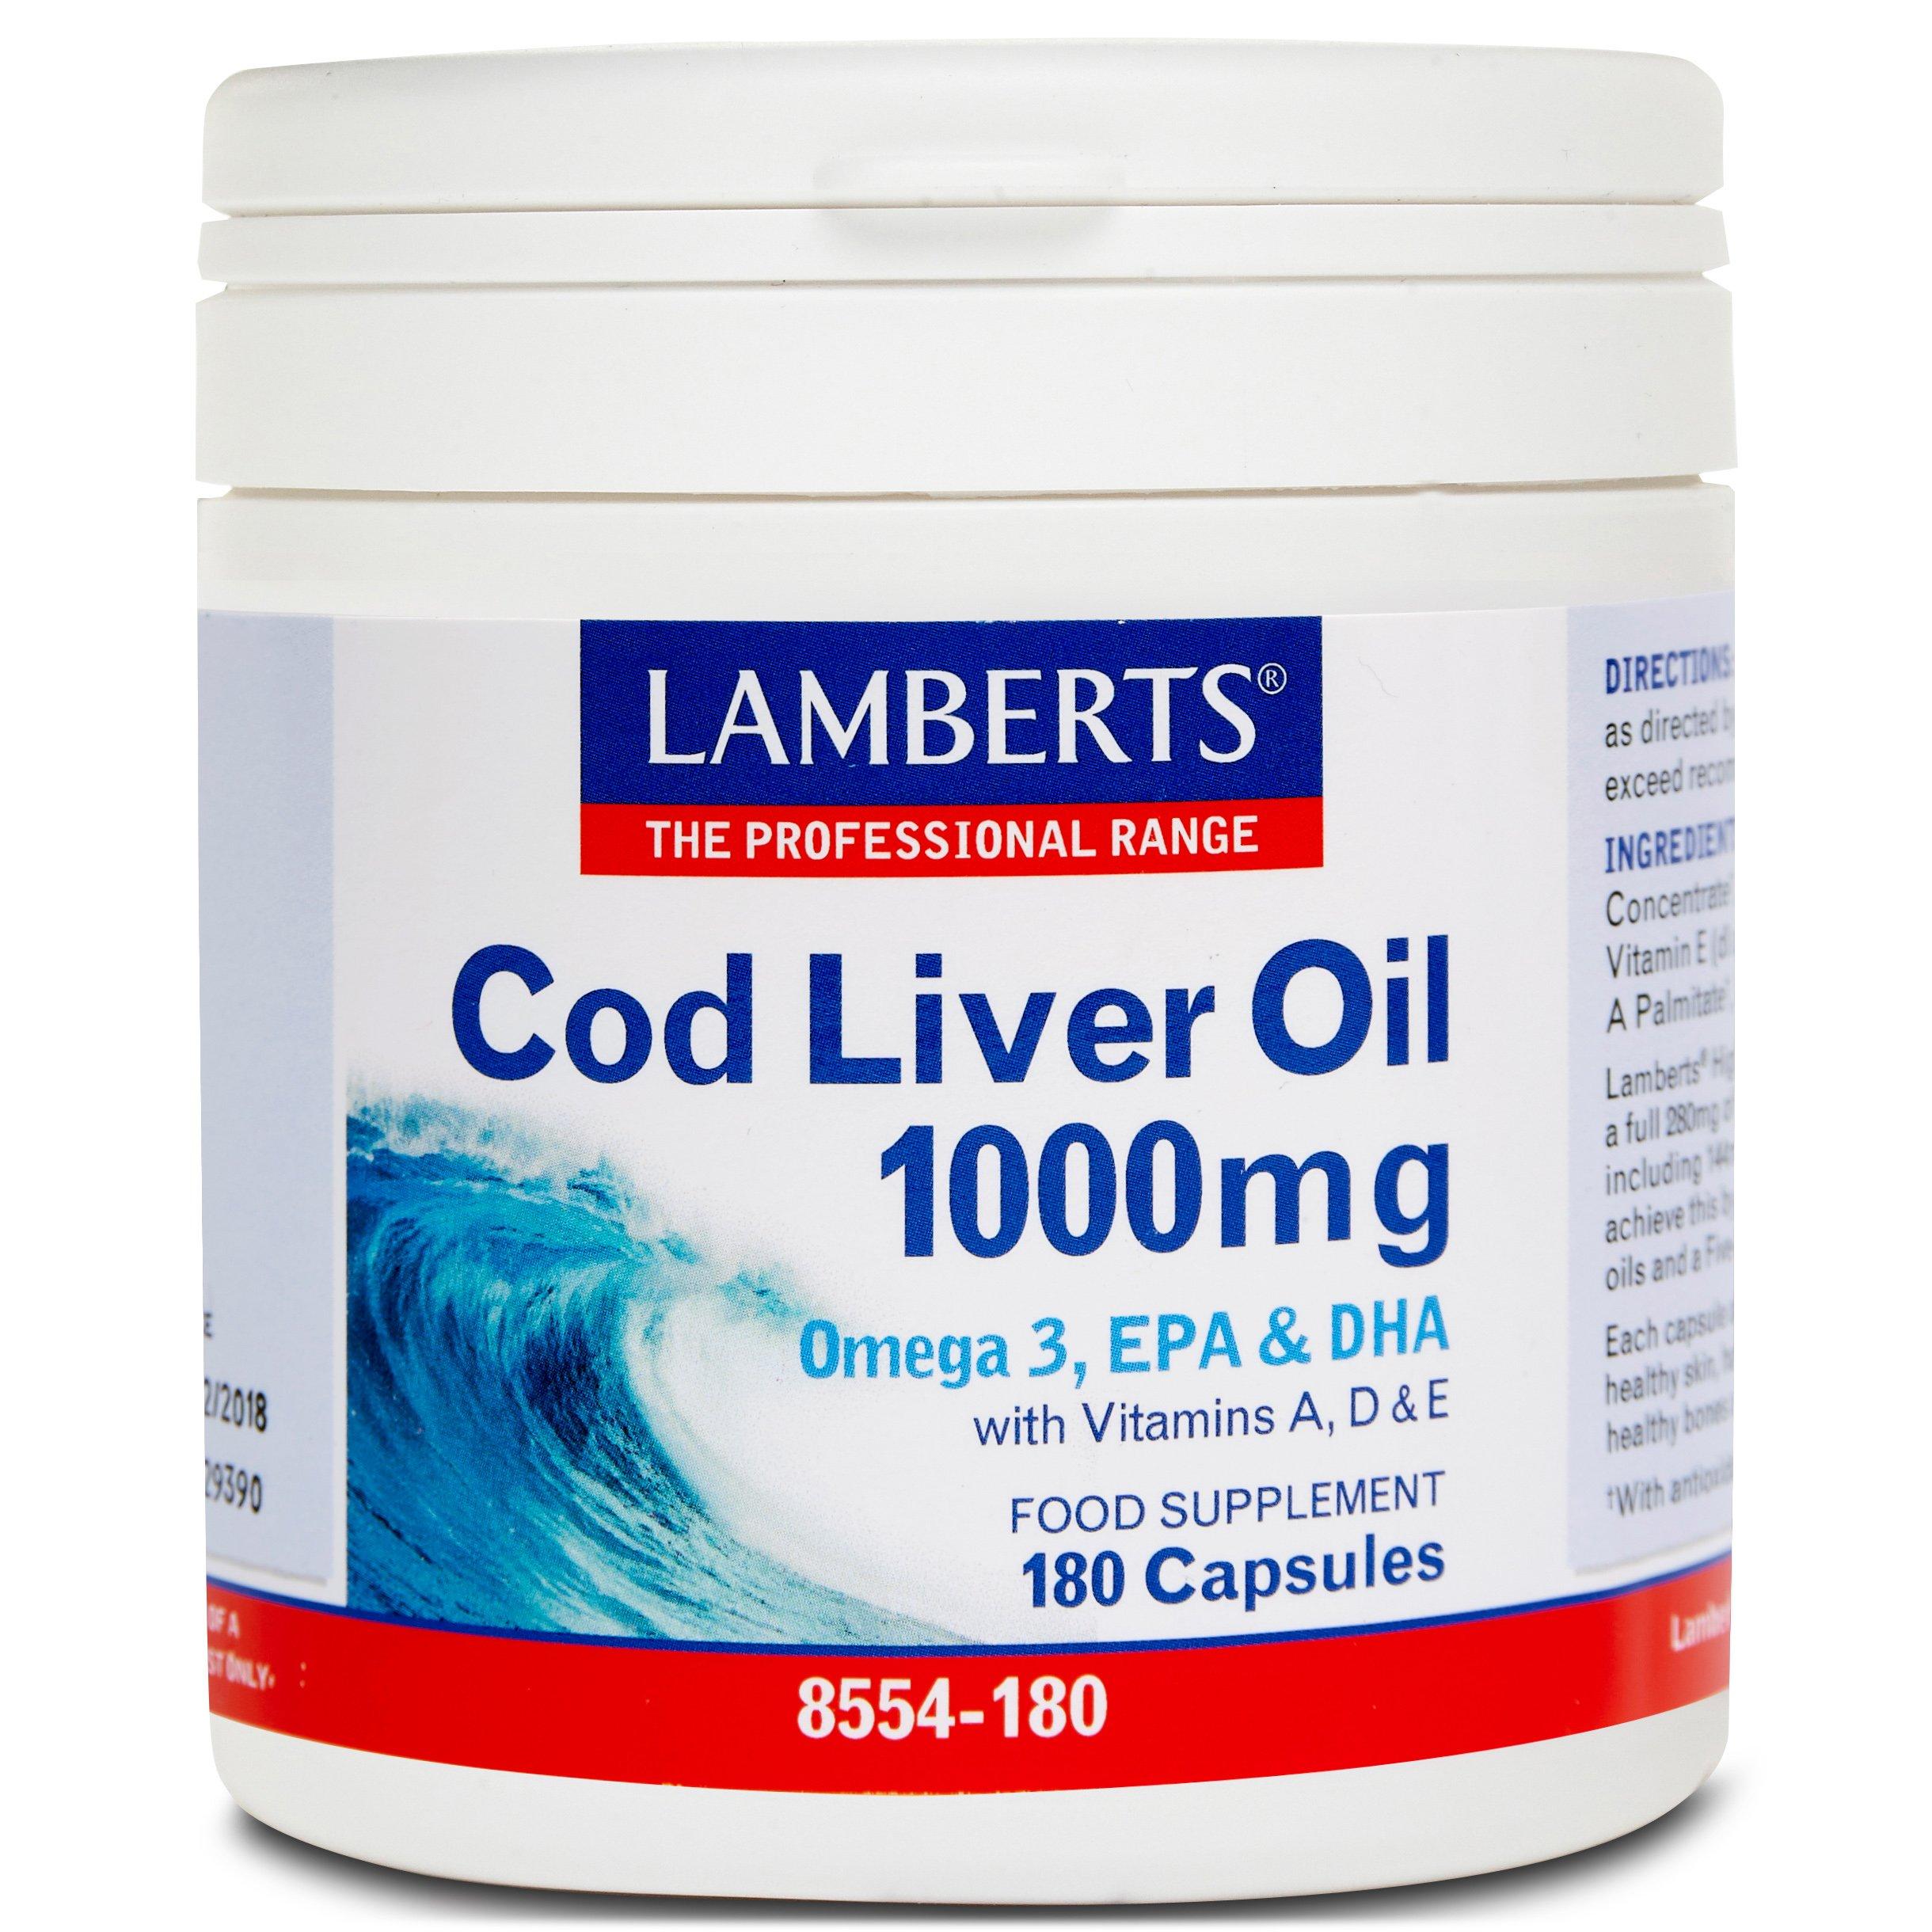 Lamberts Cod Liver Oil Συμπλήρωμα Διατροφής με Ωμέγα 3 Λιπαρά Οξέα 1000mg 180caps